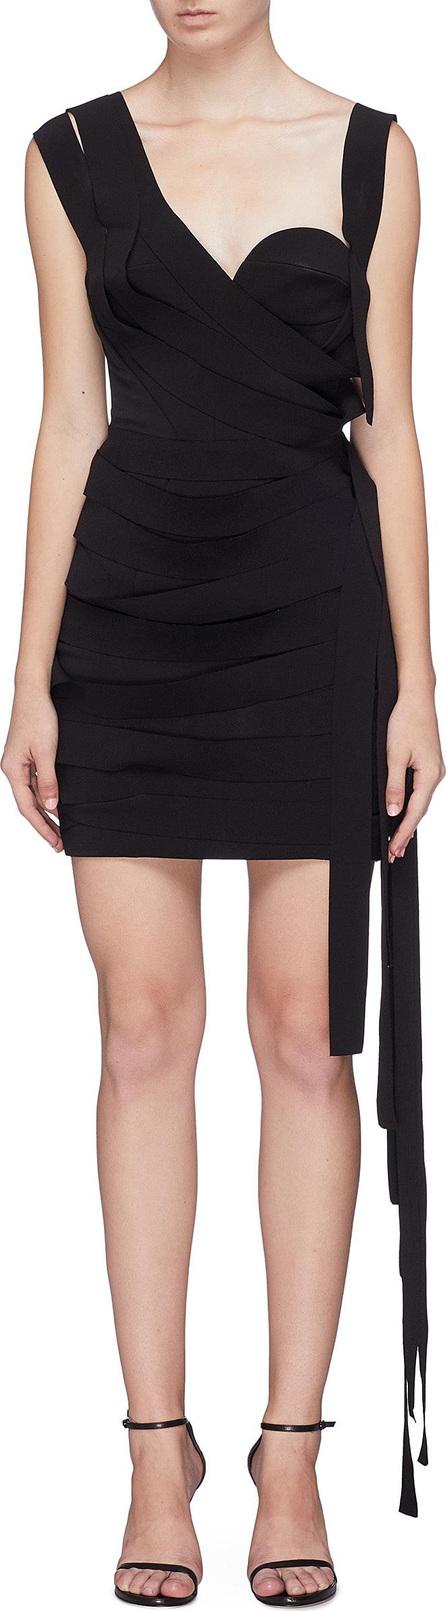 Carmen March Asymmetric strappy fringe piqué bustier dress